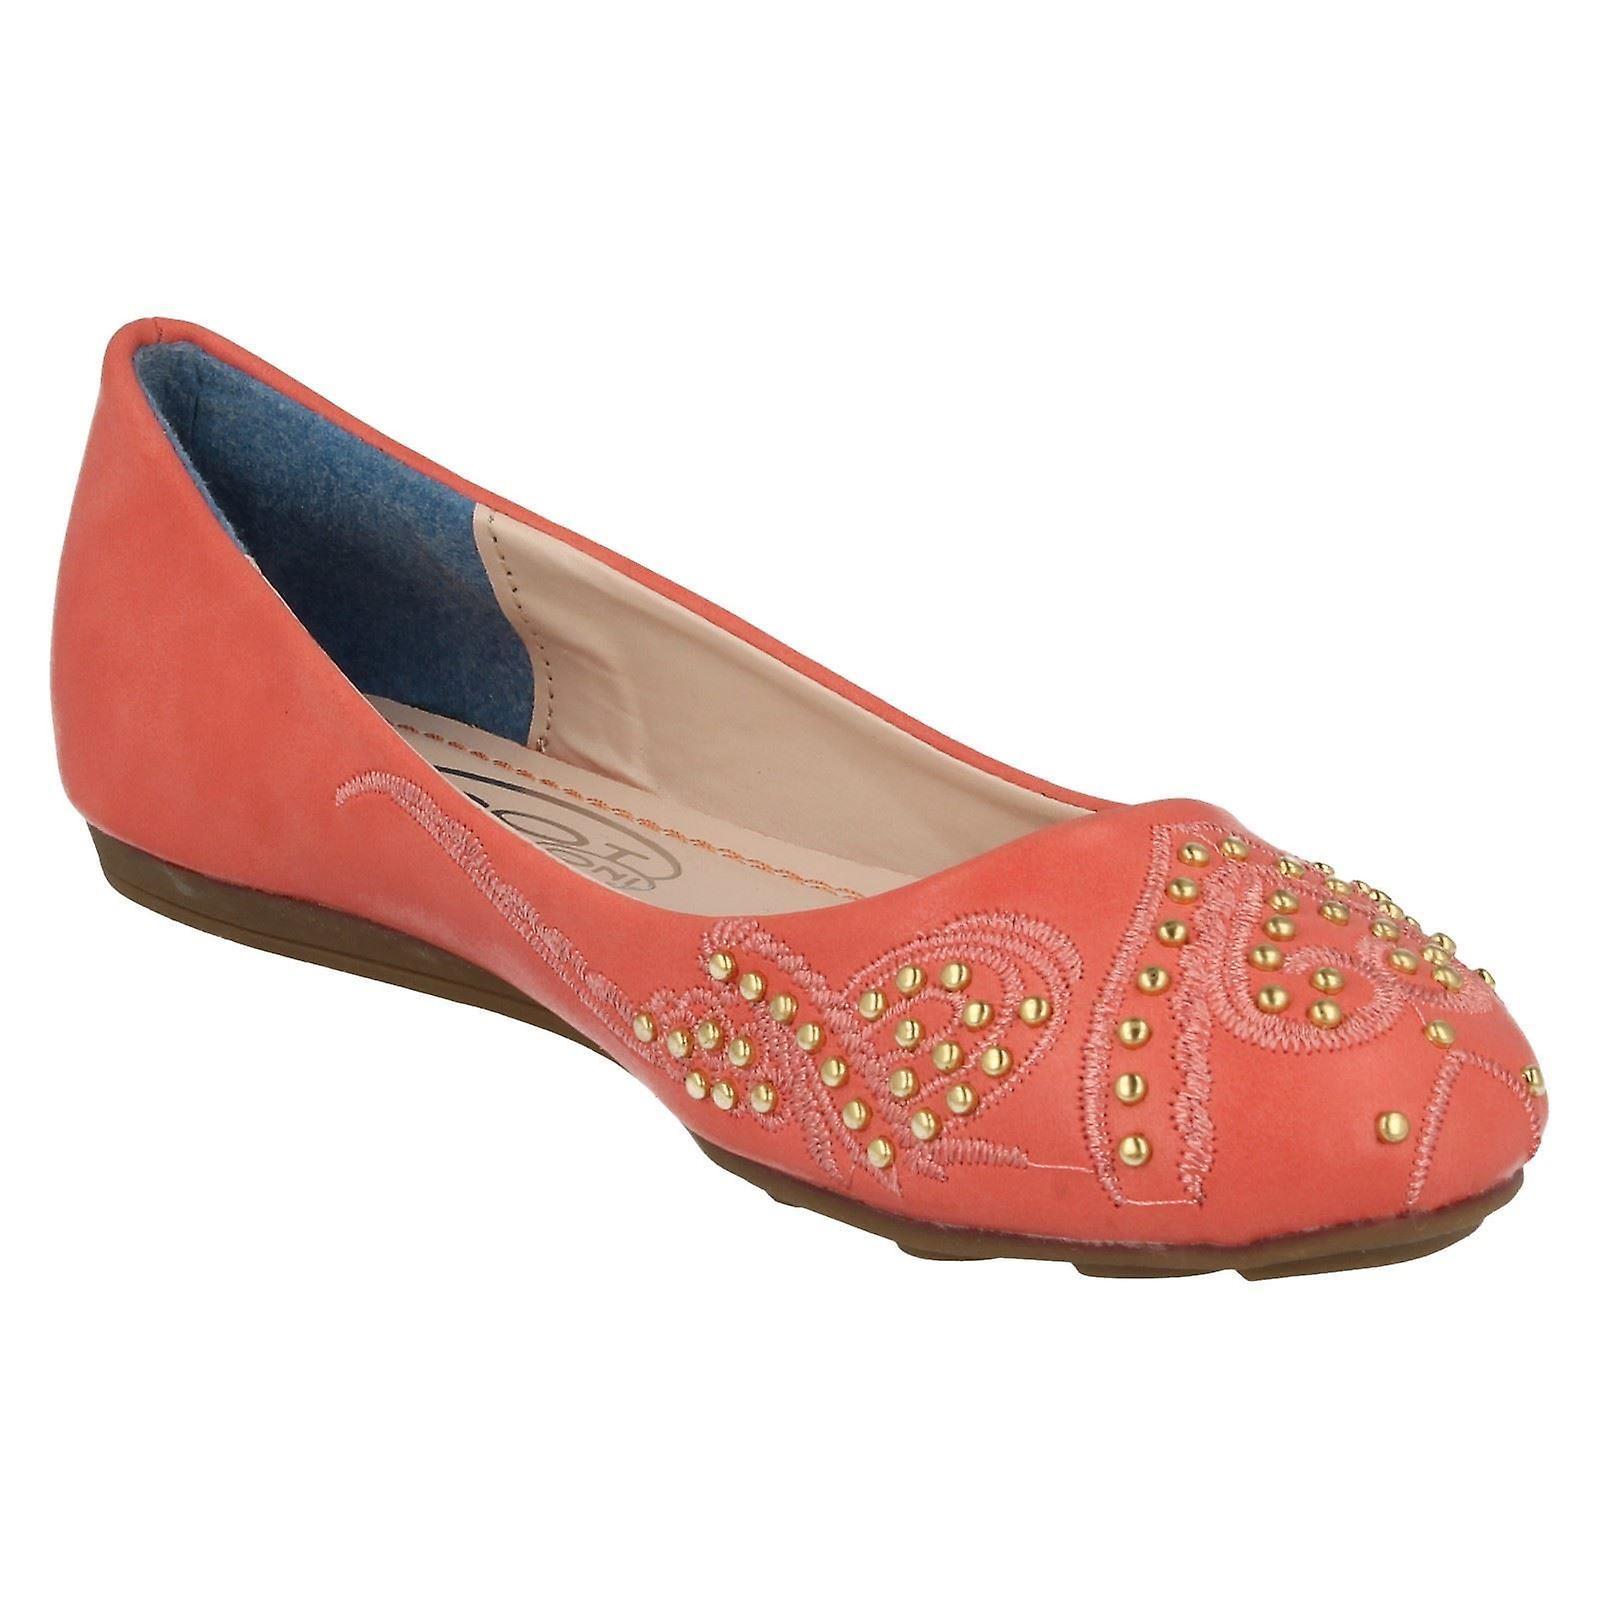 Meisjes plek op vlakke Ballet stijl schoenen H2273 - Gratis verzending BR8XIX